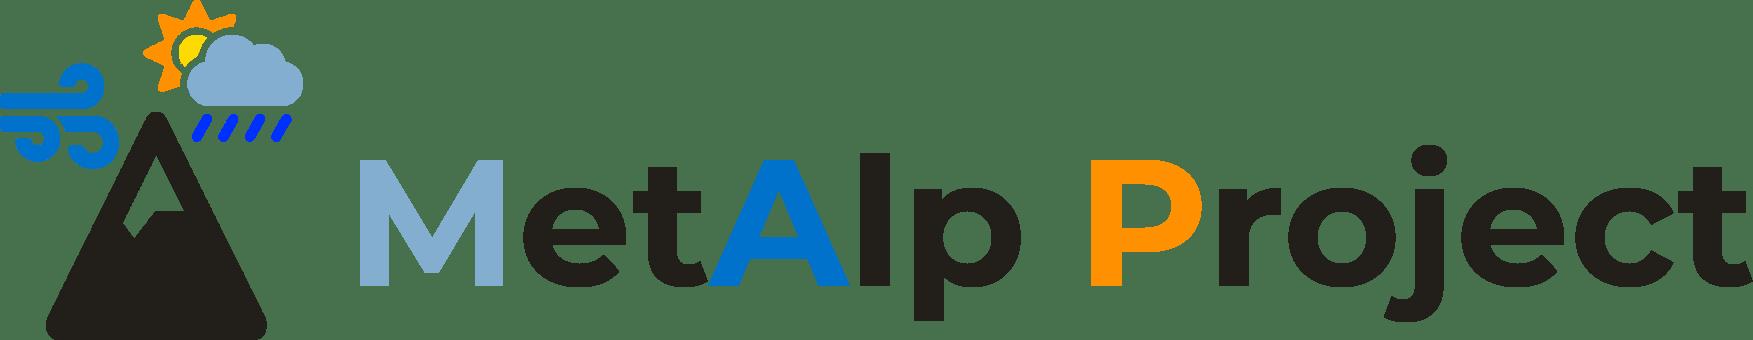 MetAlp Project